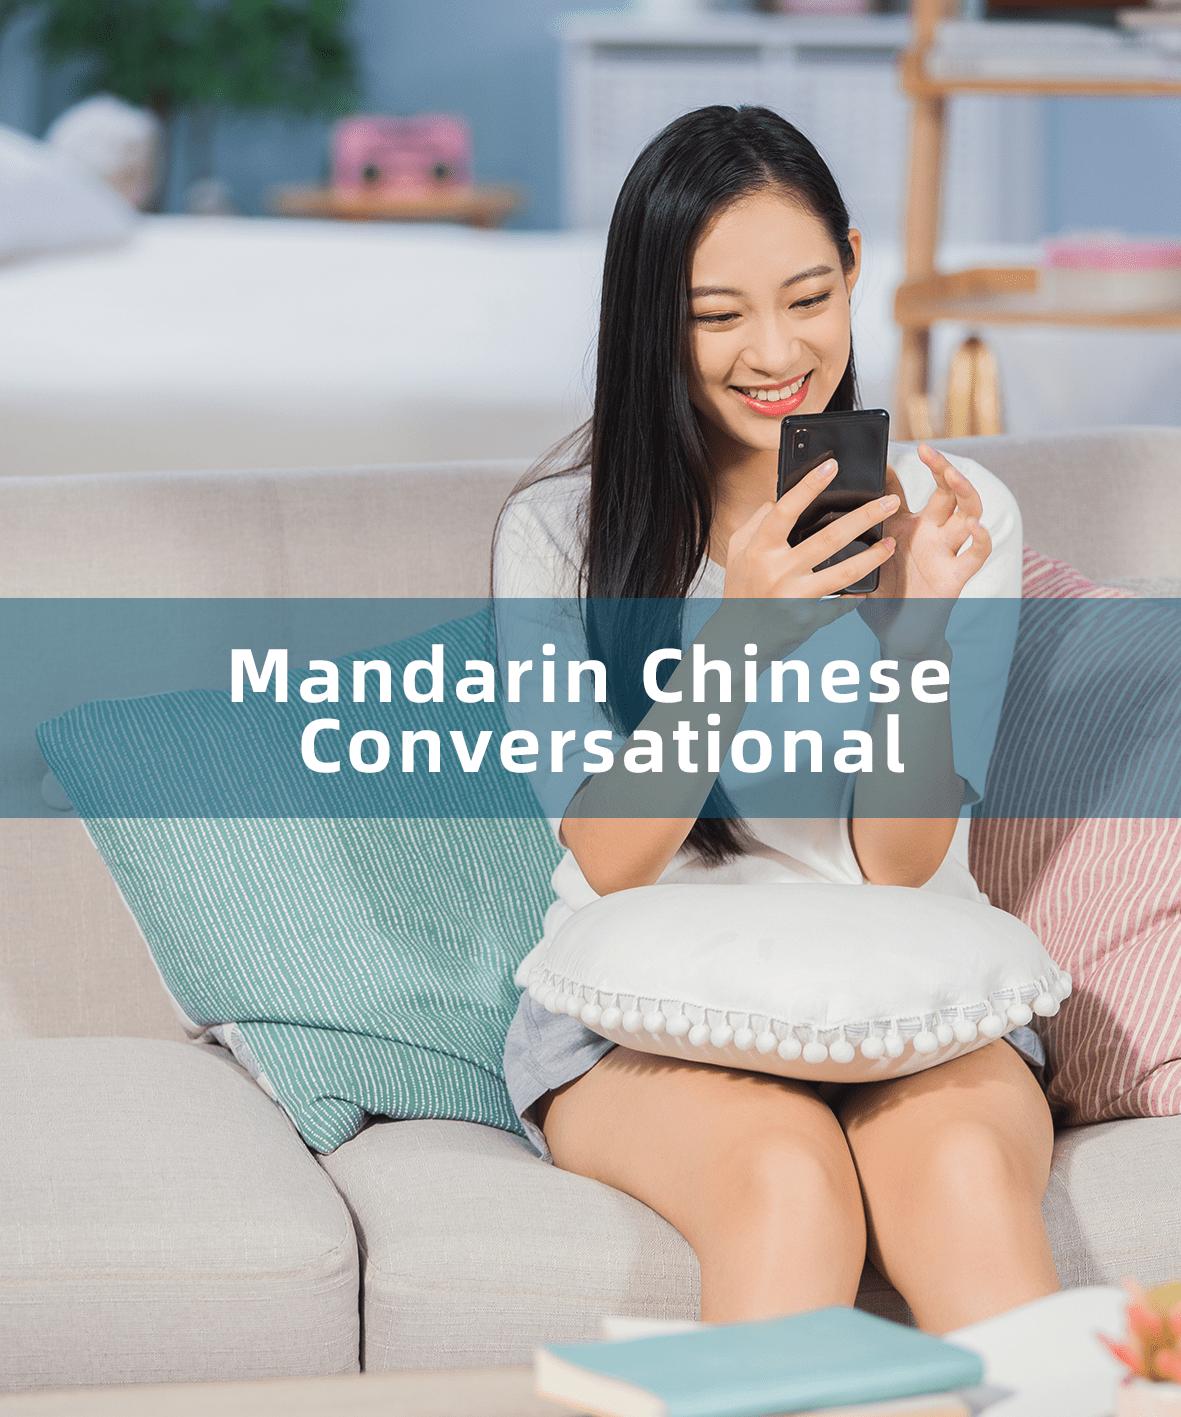 MDT-ASR-A001   中文手机对话音频数据集